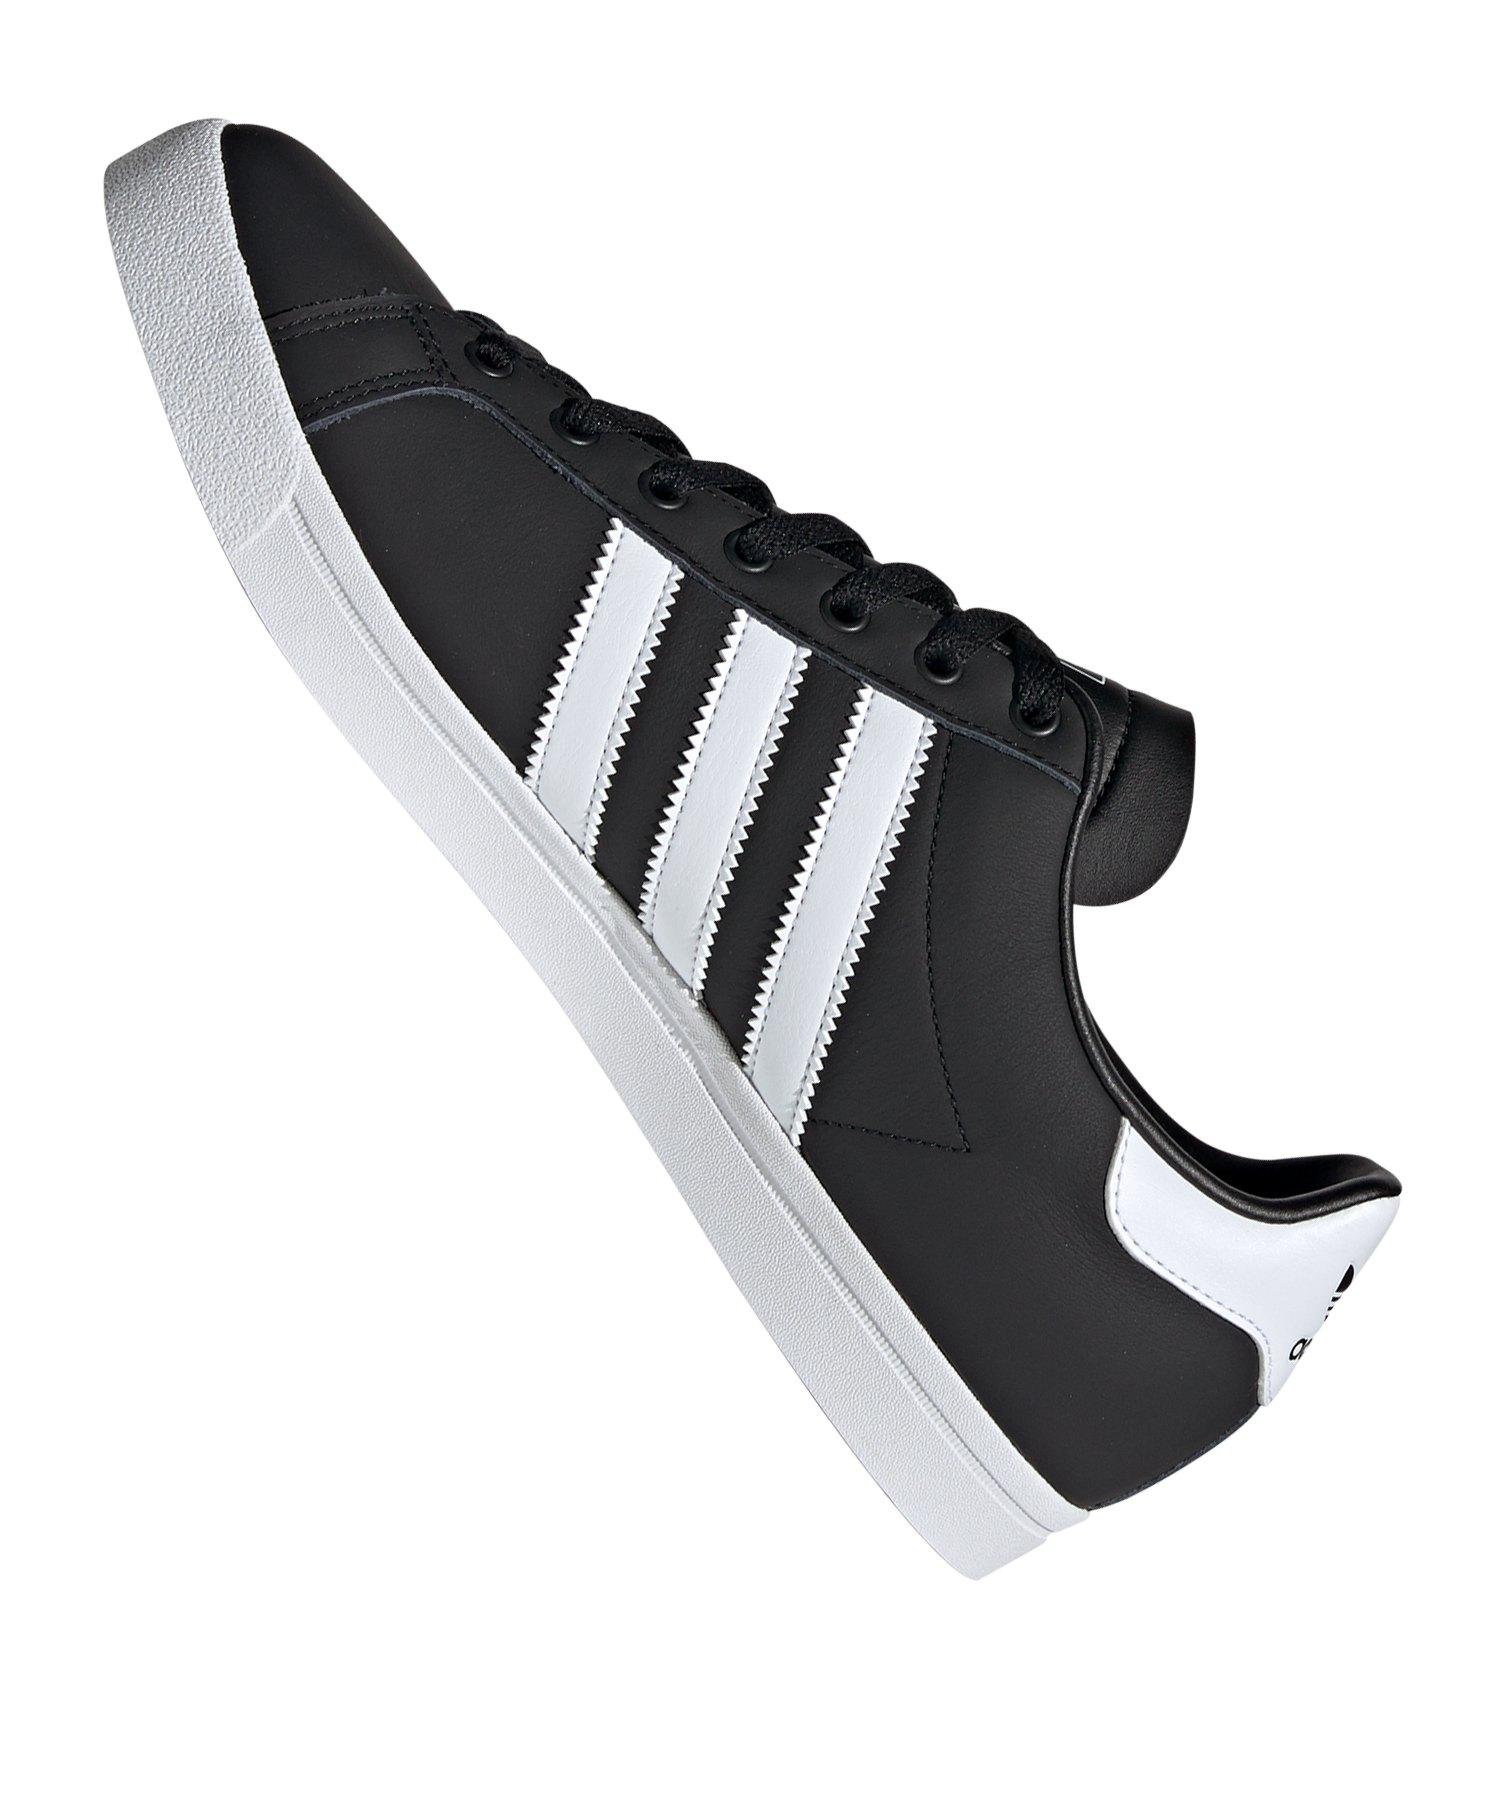 Coast Originals Sneaker Schwarz Adidas Star nOPw8Xk0